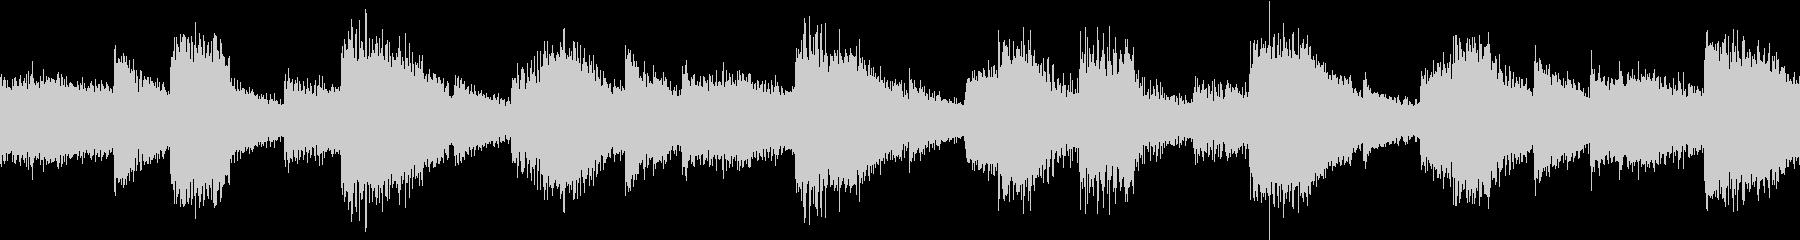 EDM Lead Loop BPM128の未再生の波形